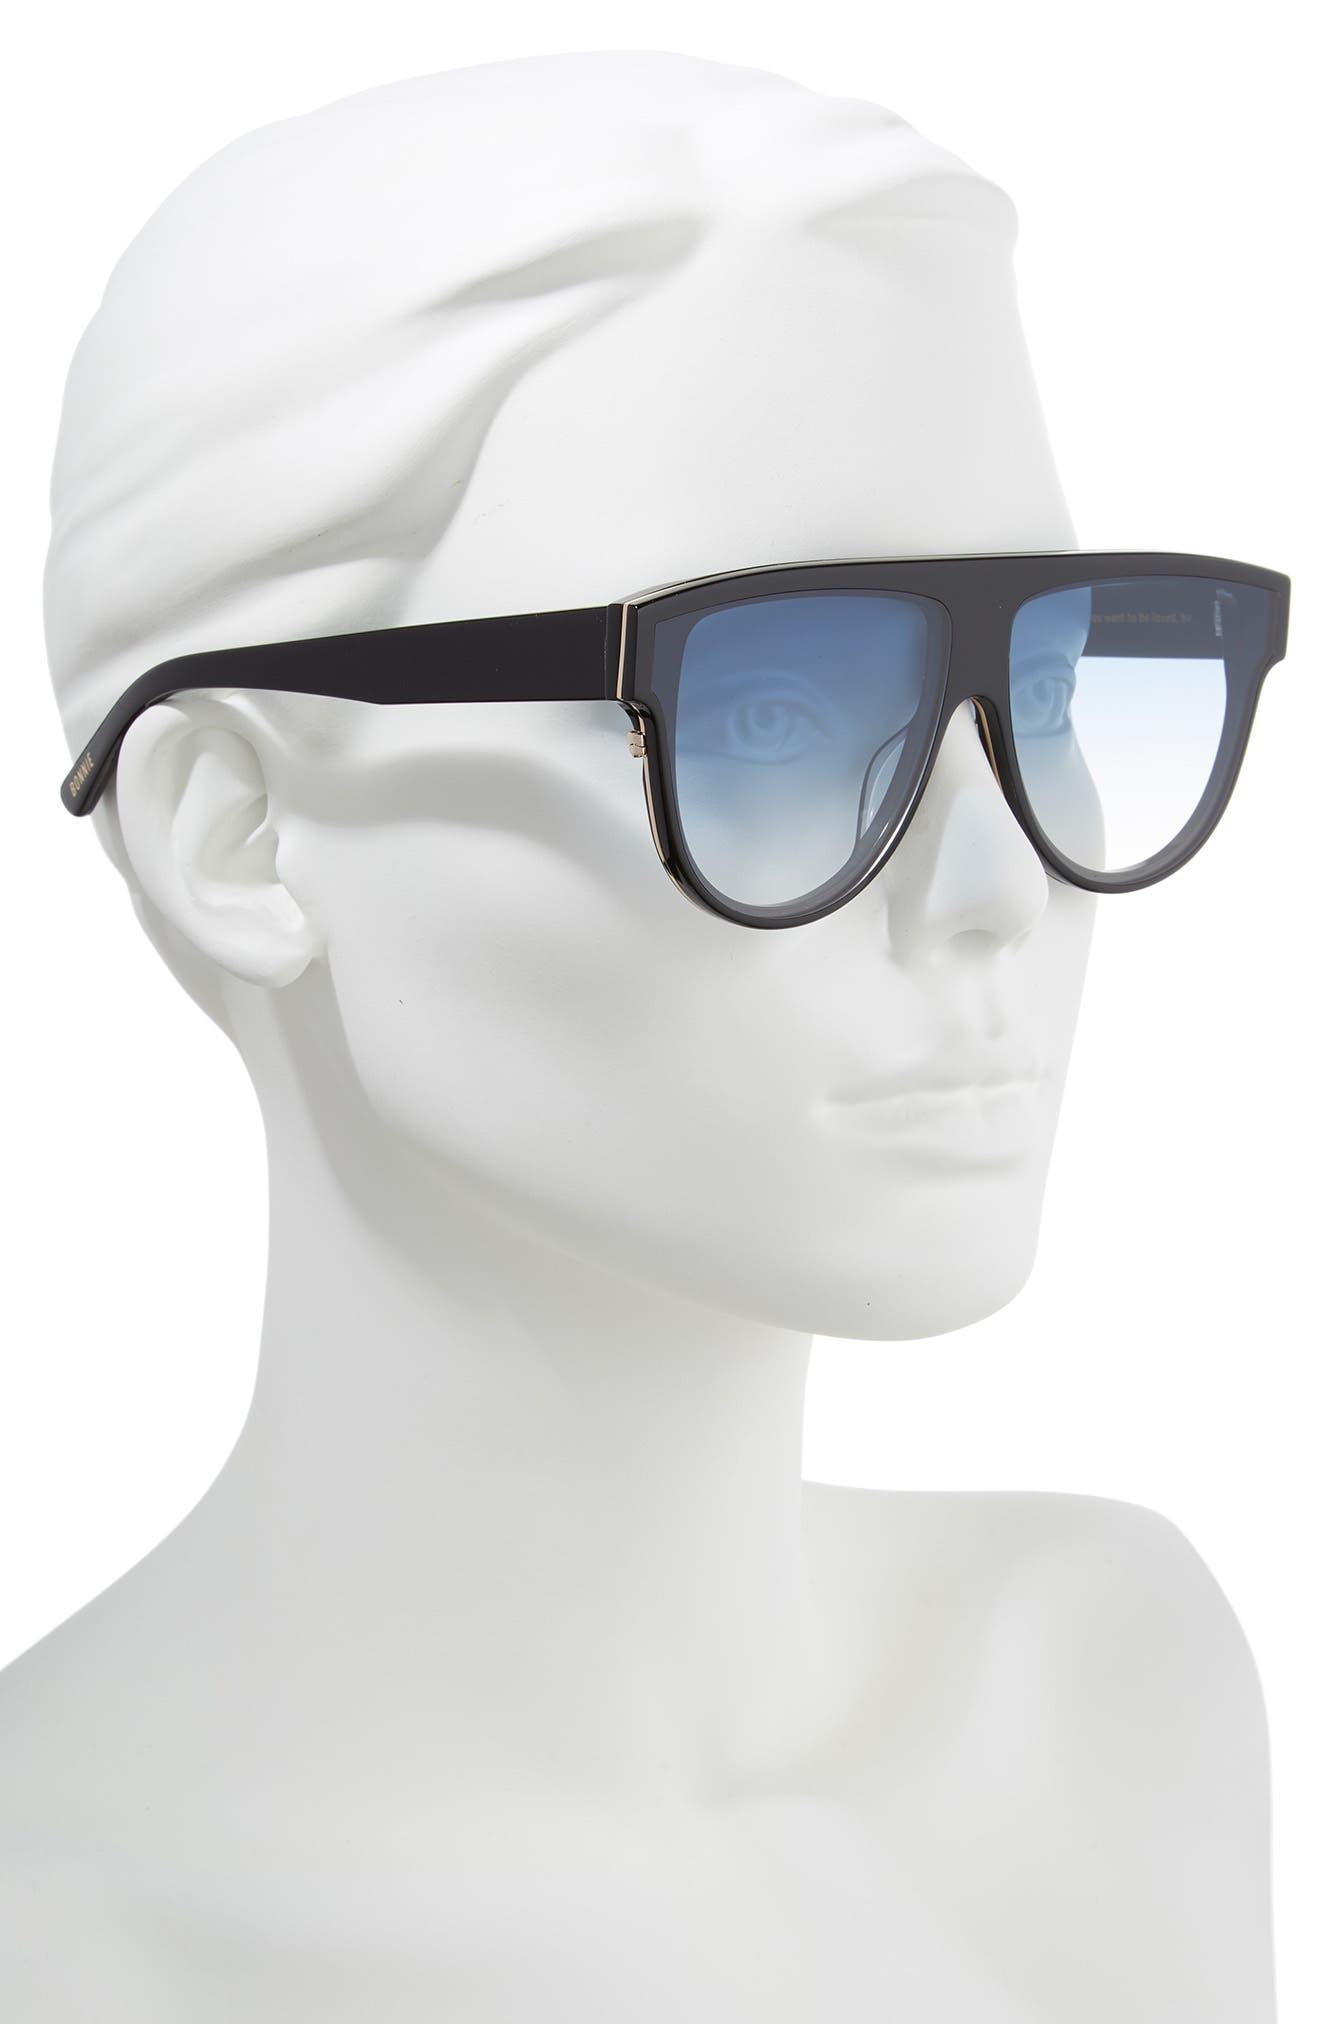 Continuum 63mm Oversize Flat Top Sunglasses,                             Alternate thumbnail 2, color,                             Blue Gradient